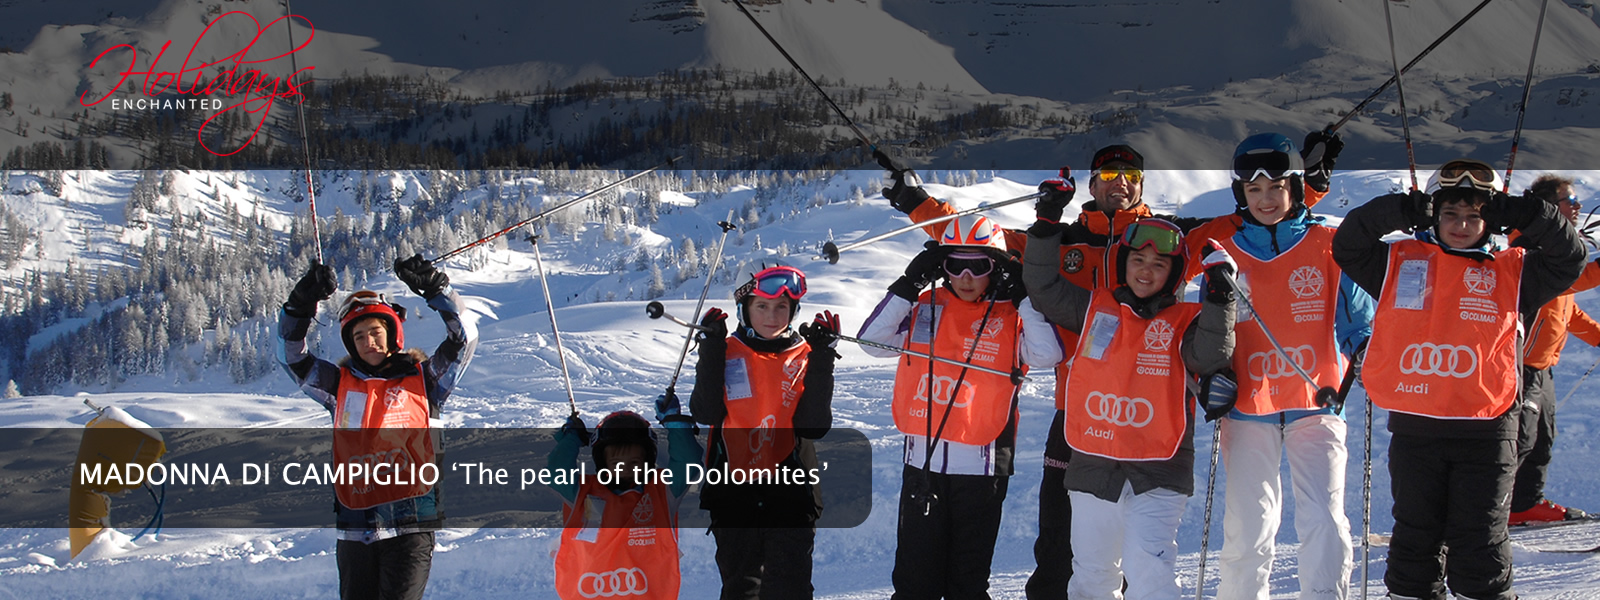 Ski School at Madonna di Campiglio